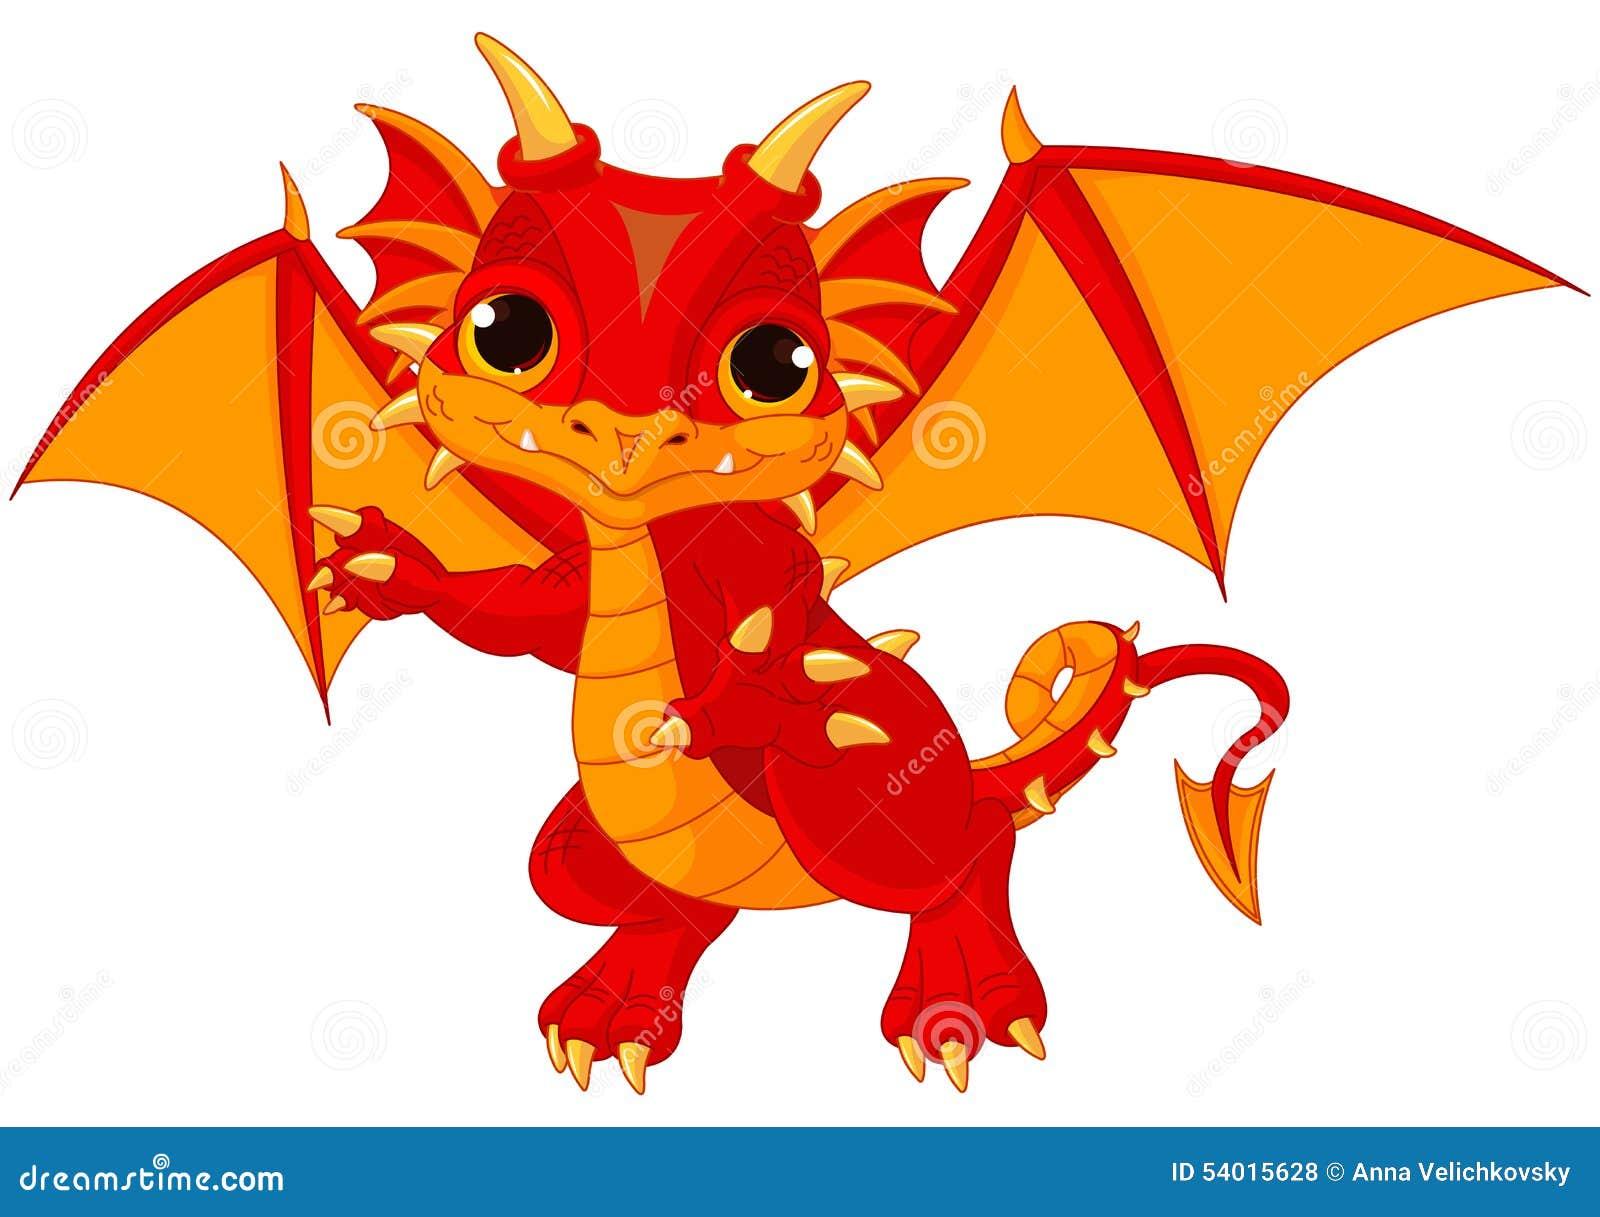 Baby Dragon Stock Vector - Image: 54015628